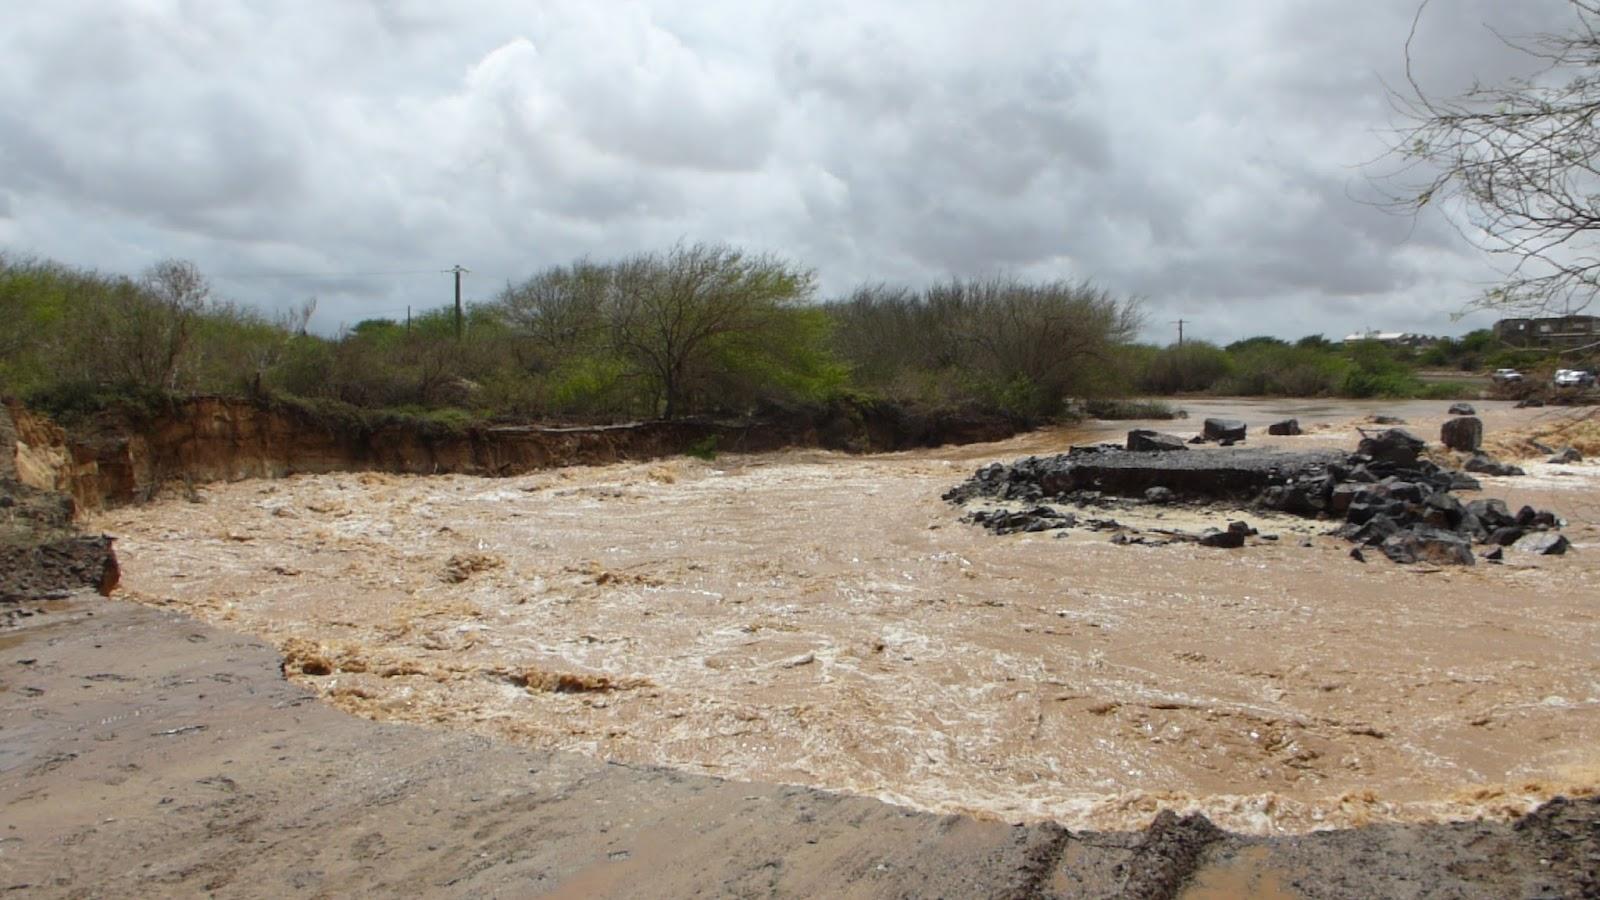 The rain came - the bridge went